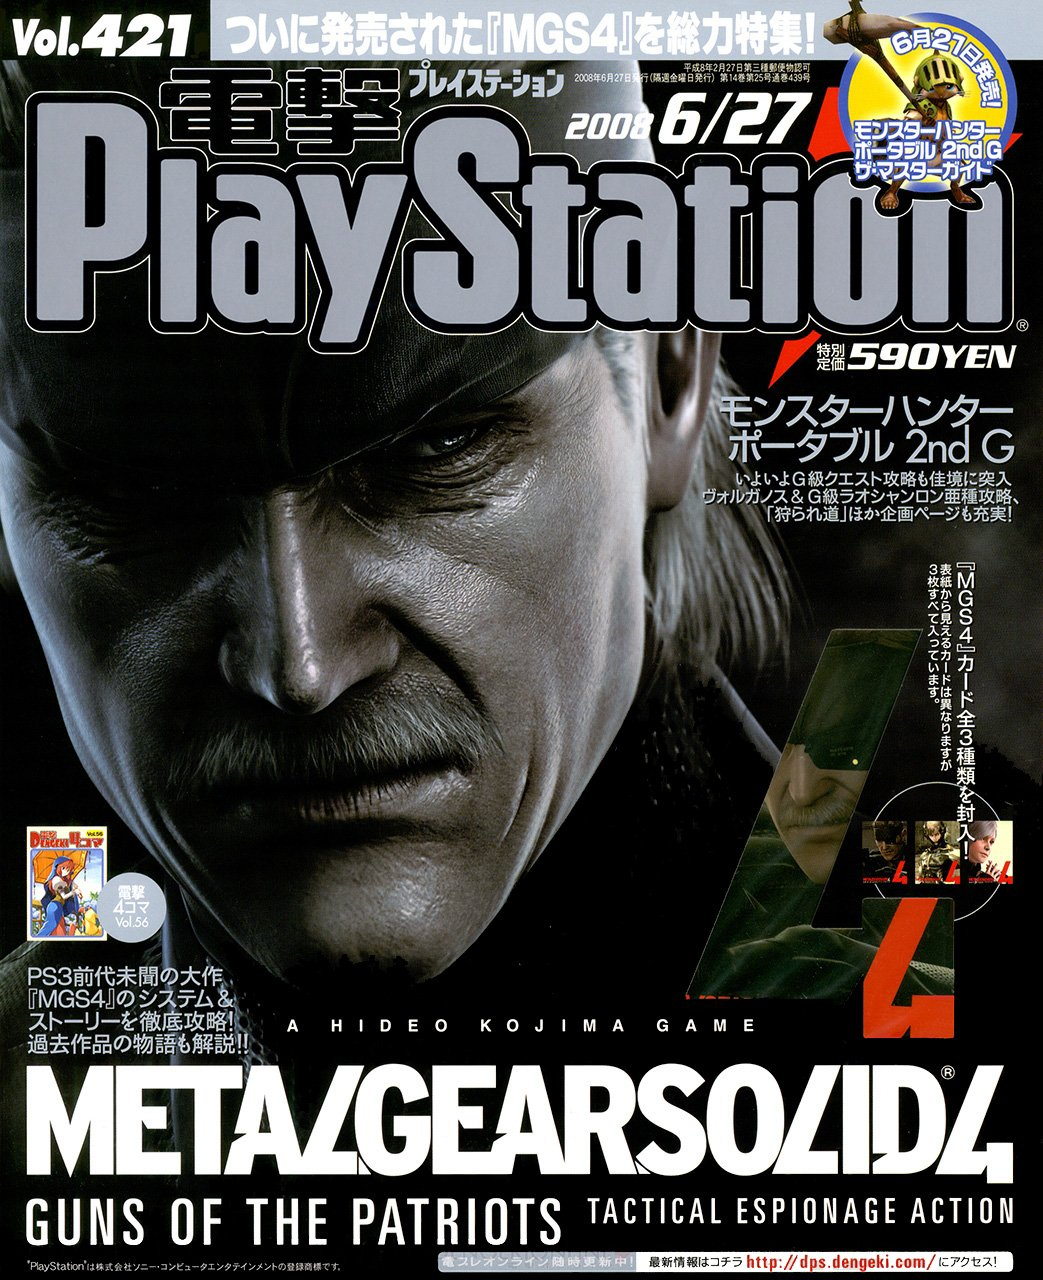 Dengeki PlayStation 421 (June 27, 2008)